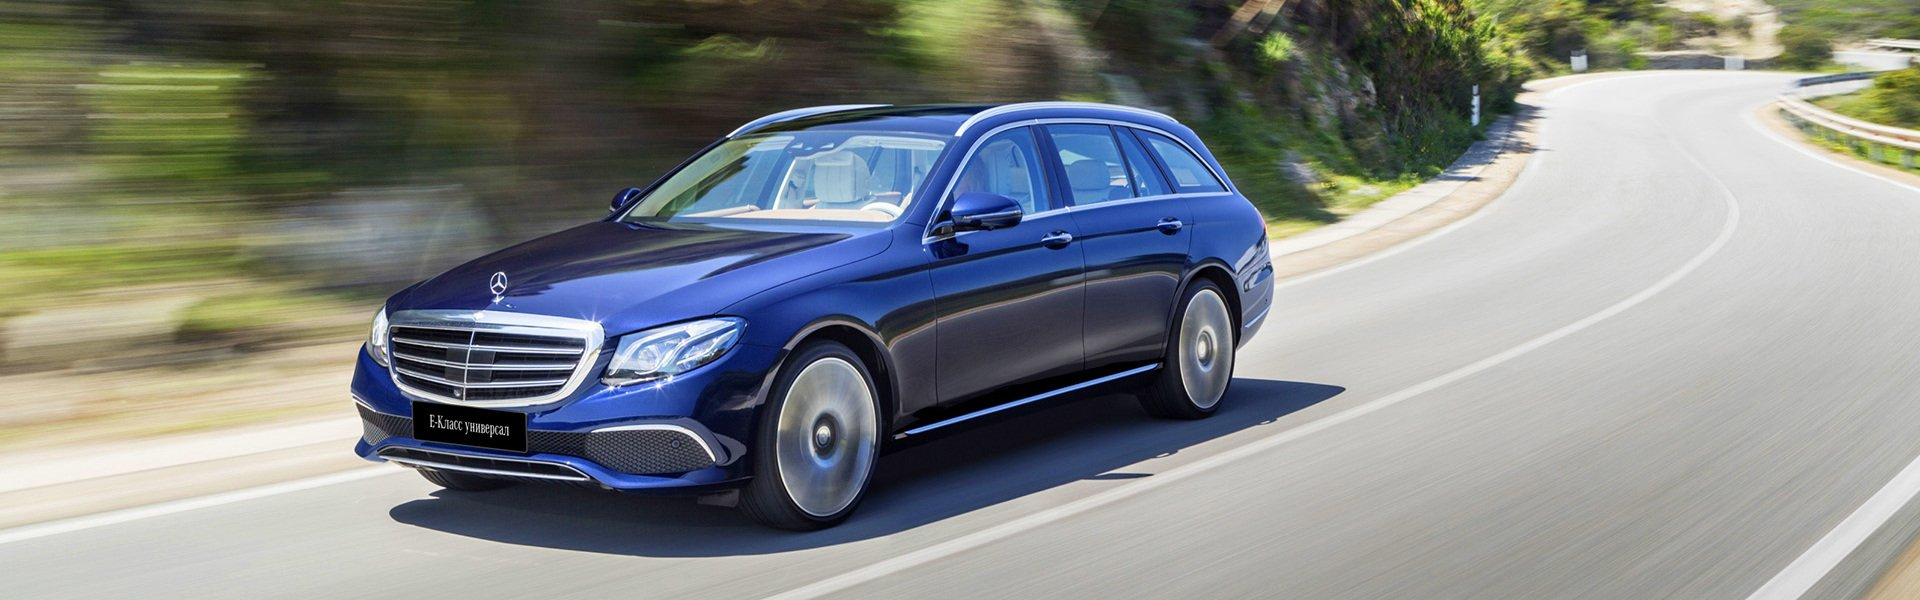 Mercedes-AMG E-Класс универсал